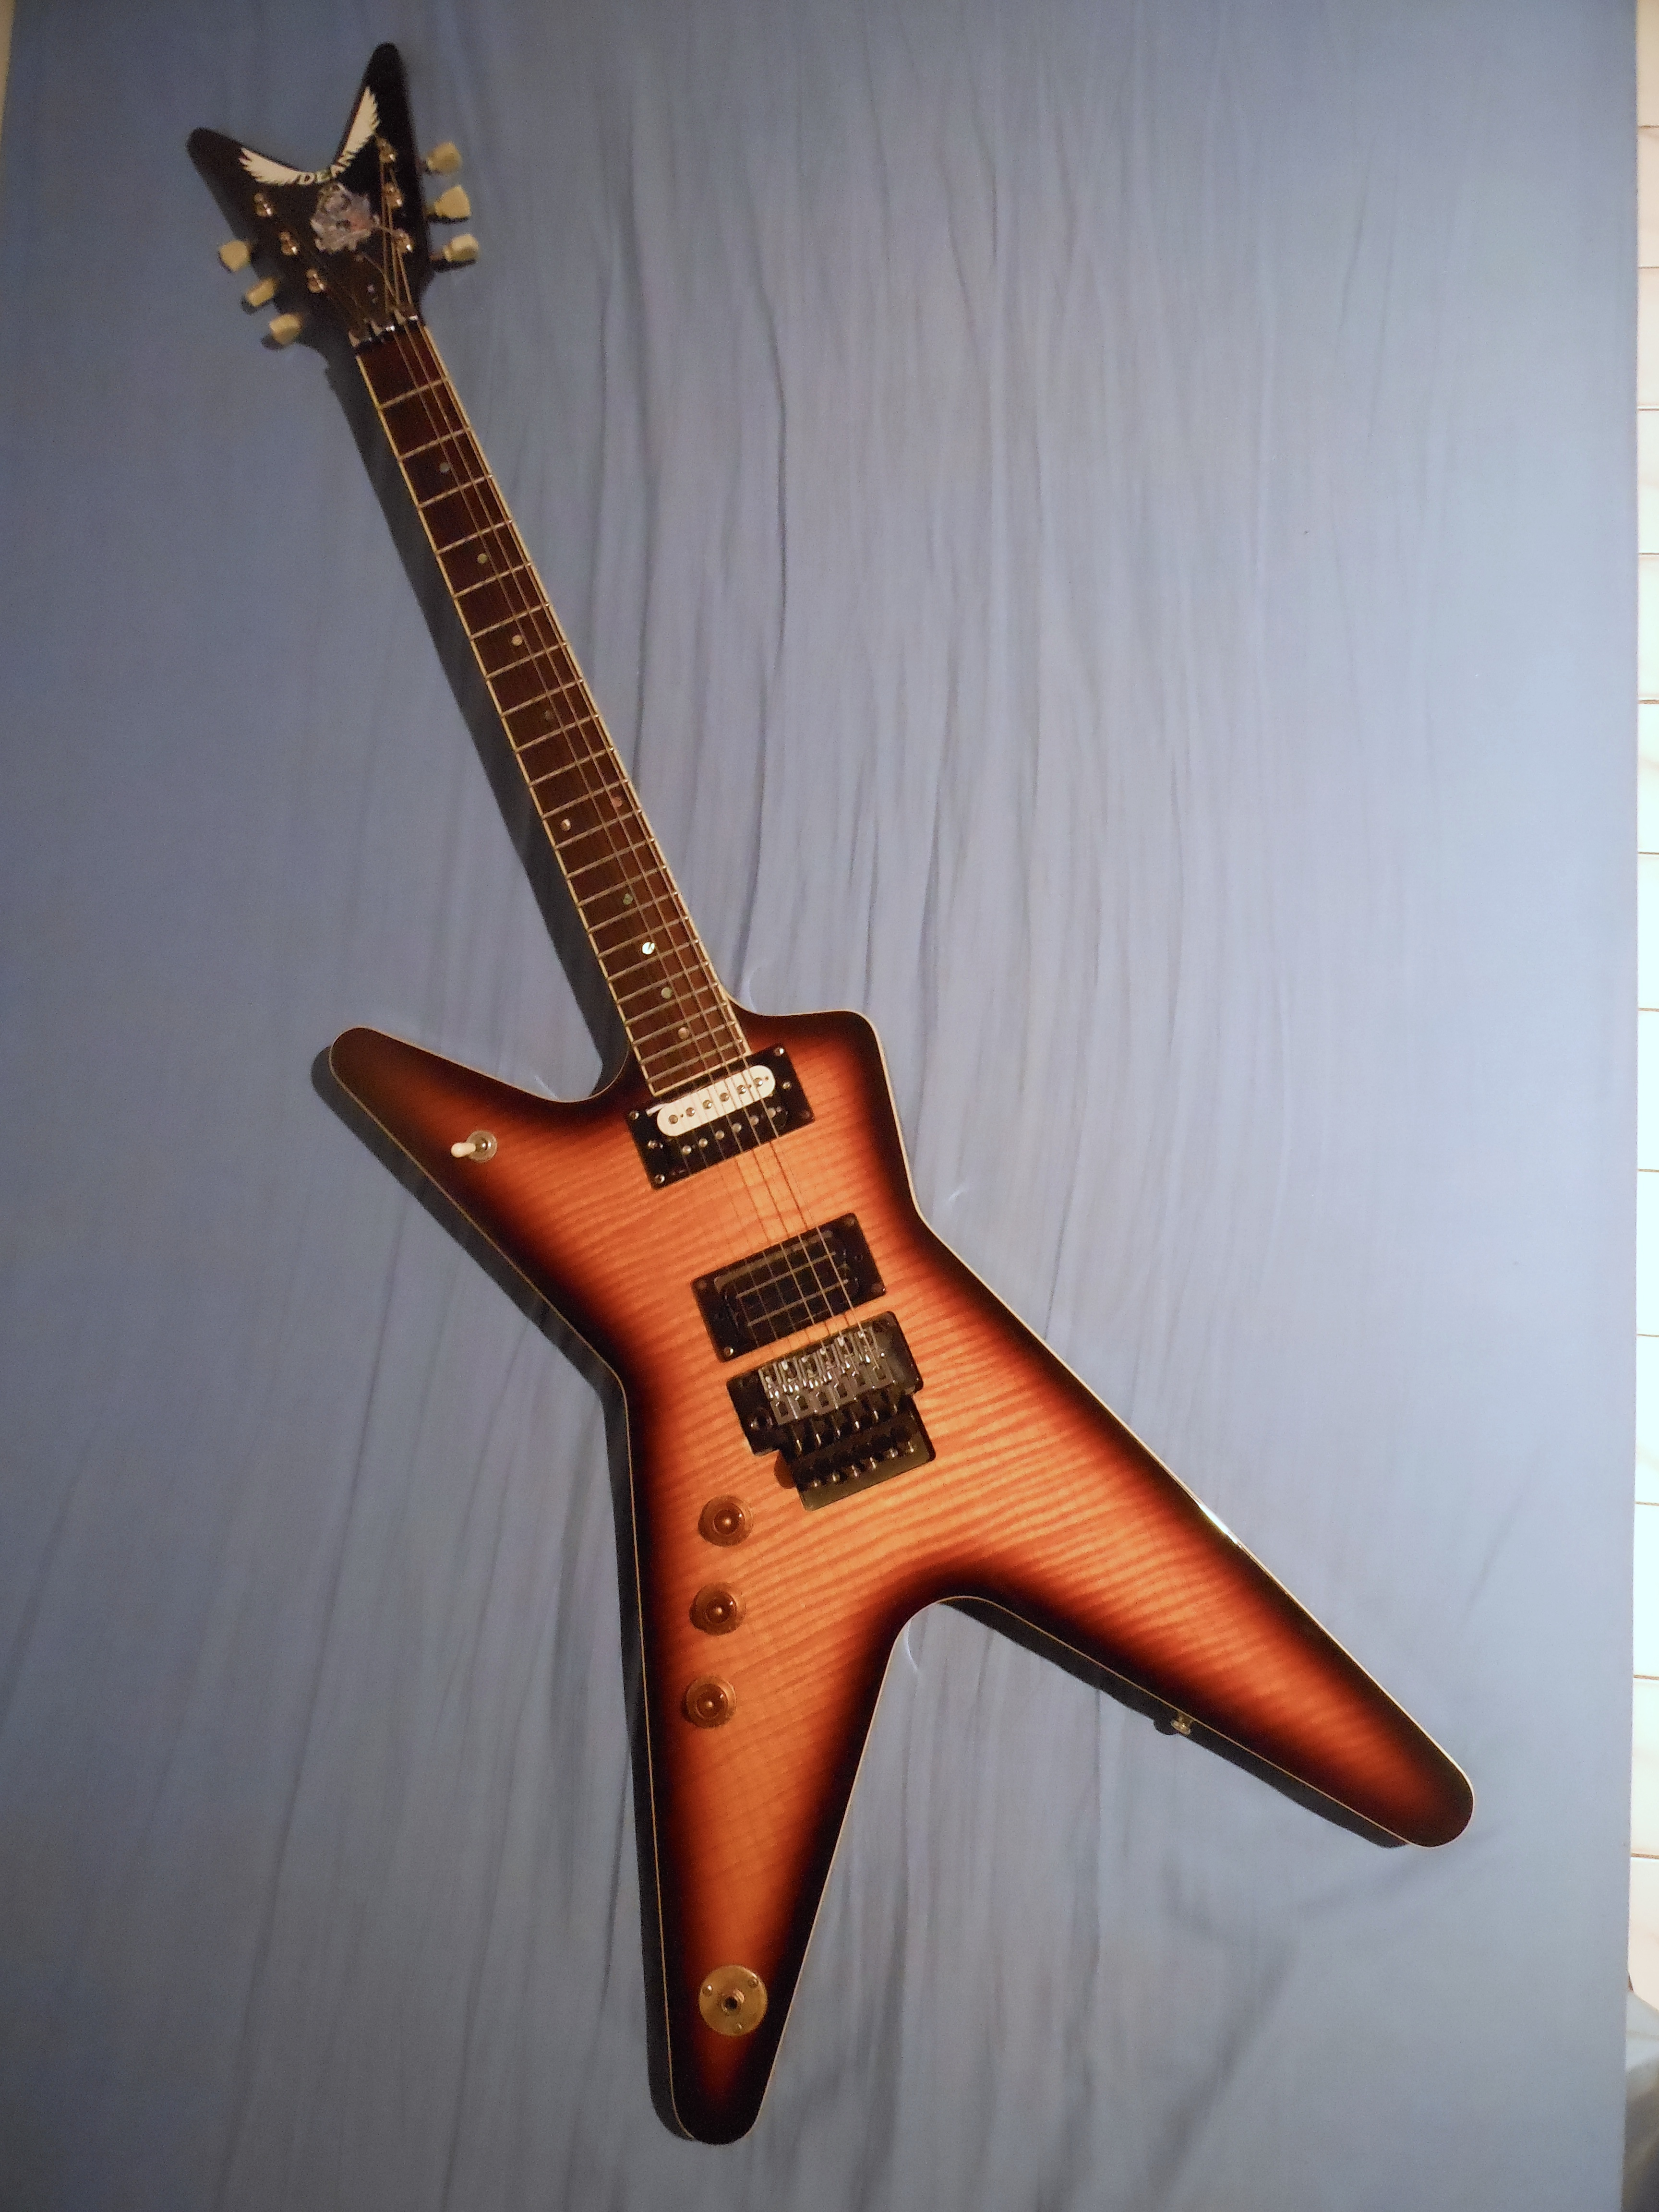 Dean Guitars Dimebag Format: jpg - size: 3456 x